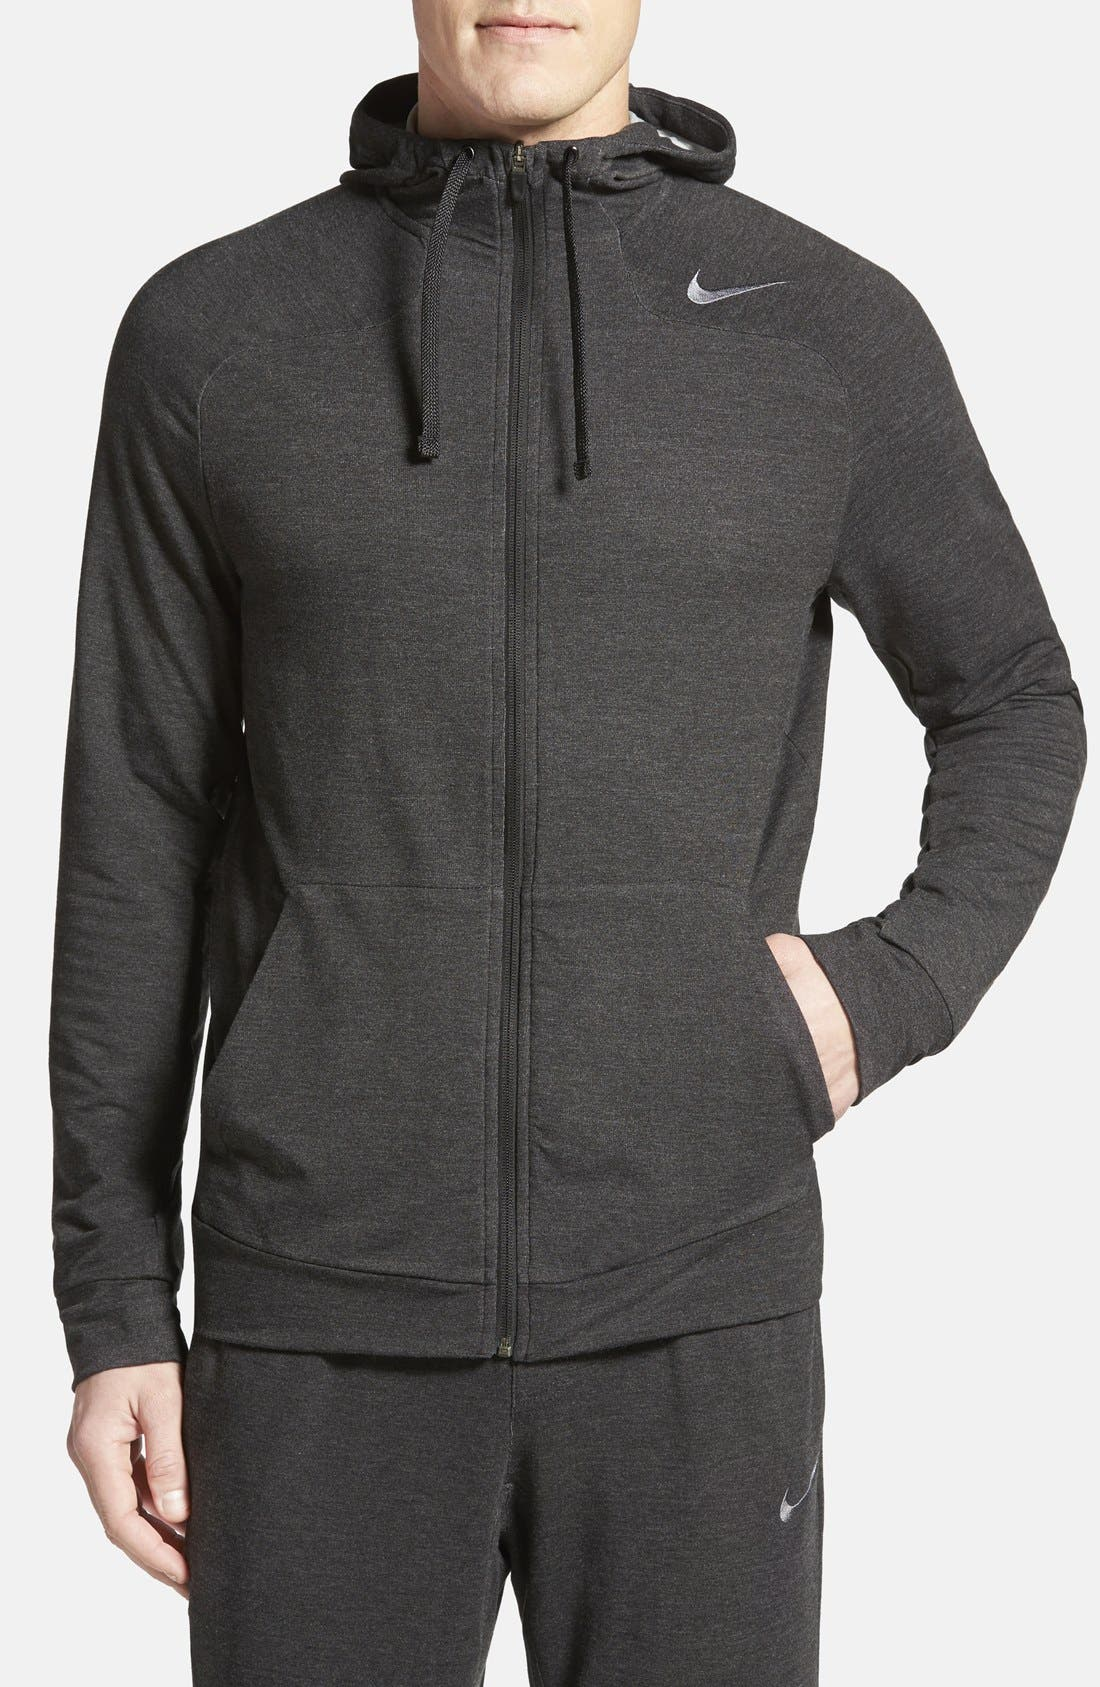 NIKE Dri-FIT Touch Fleece Full Zip Hoodie, Main, color, 010